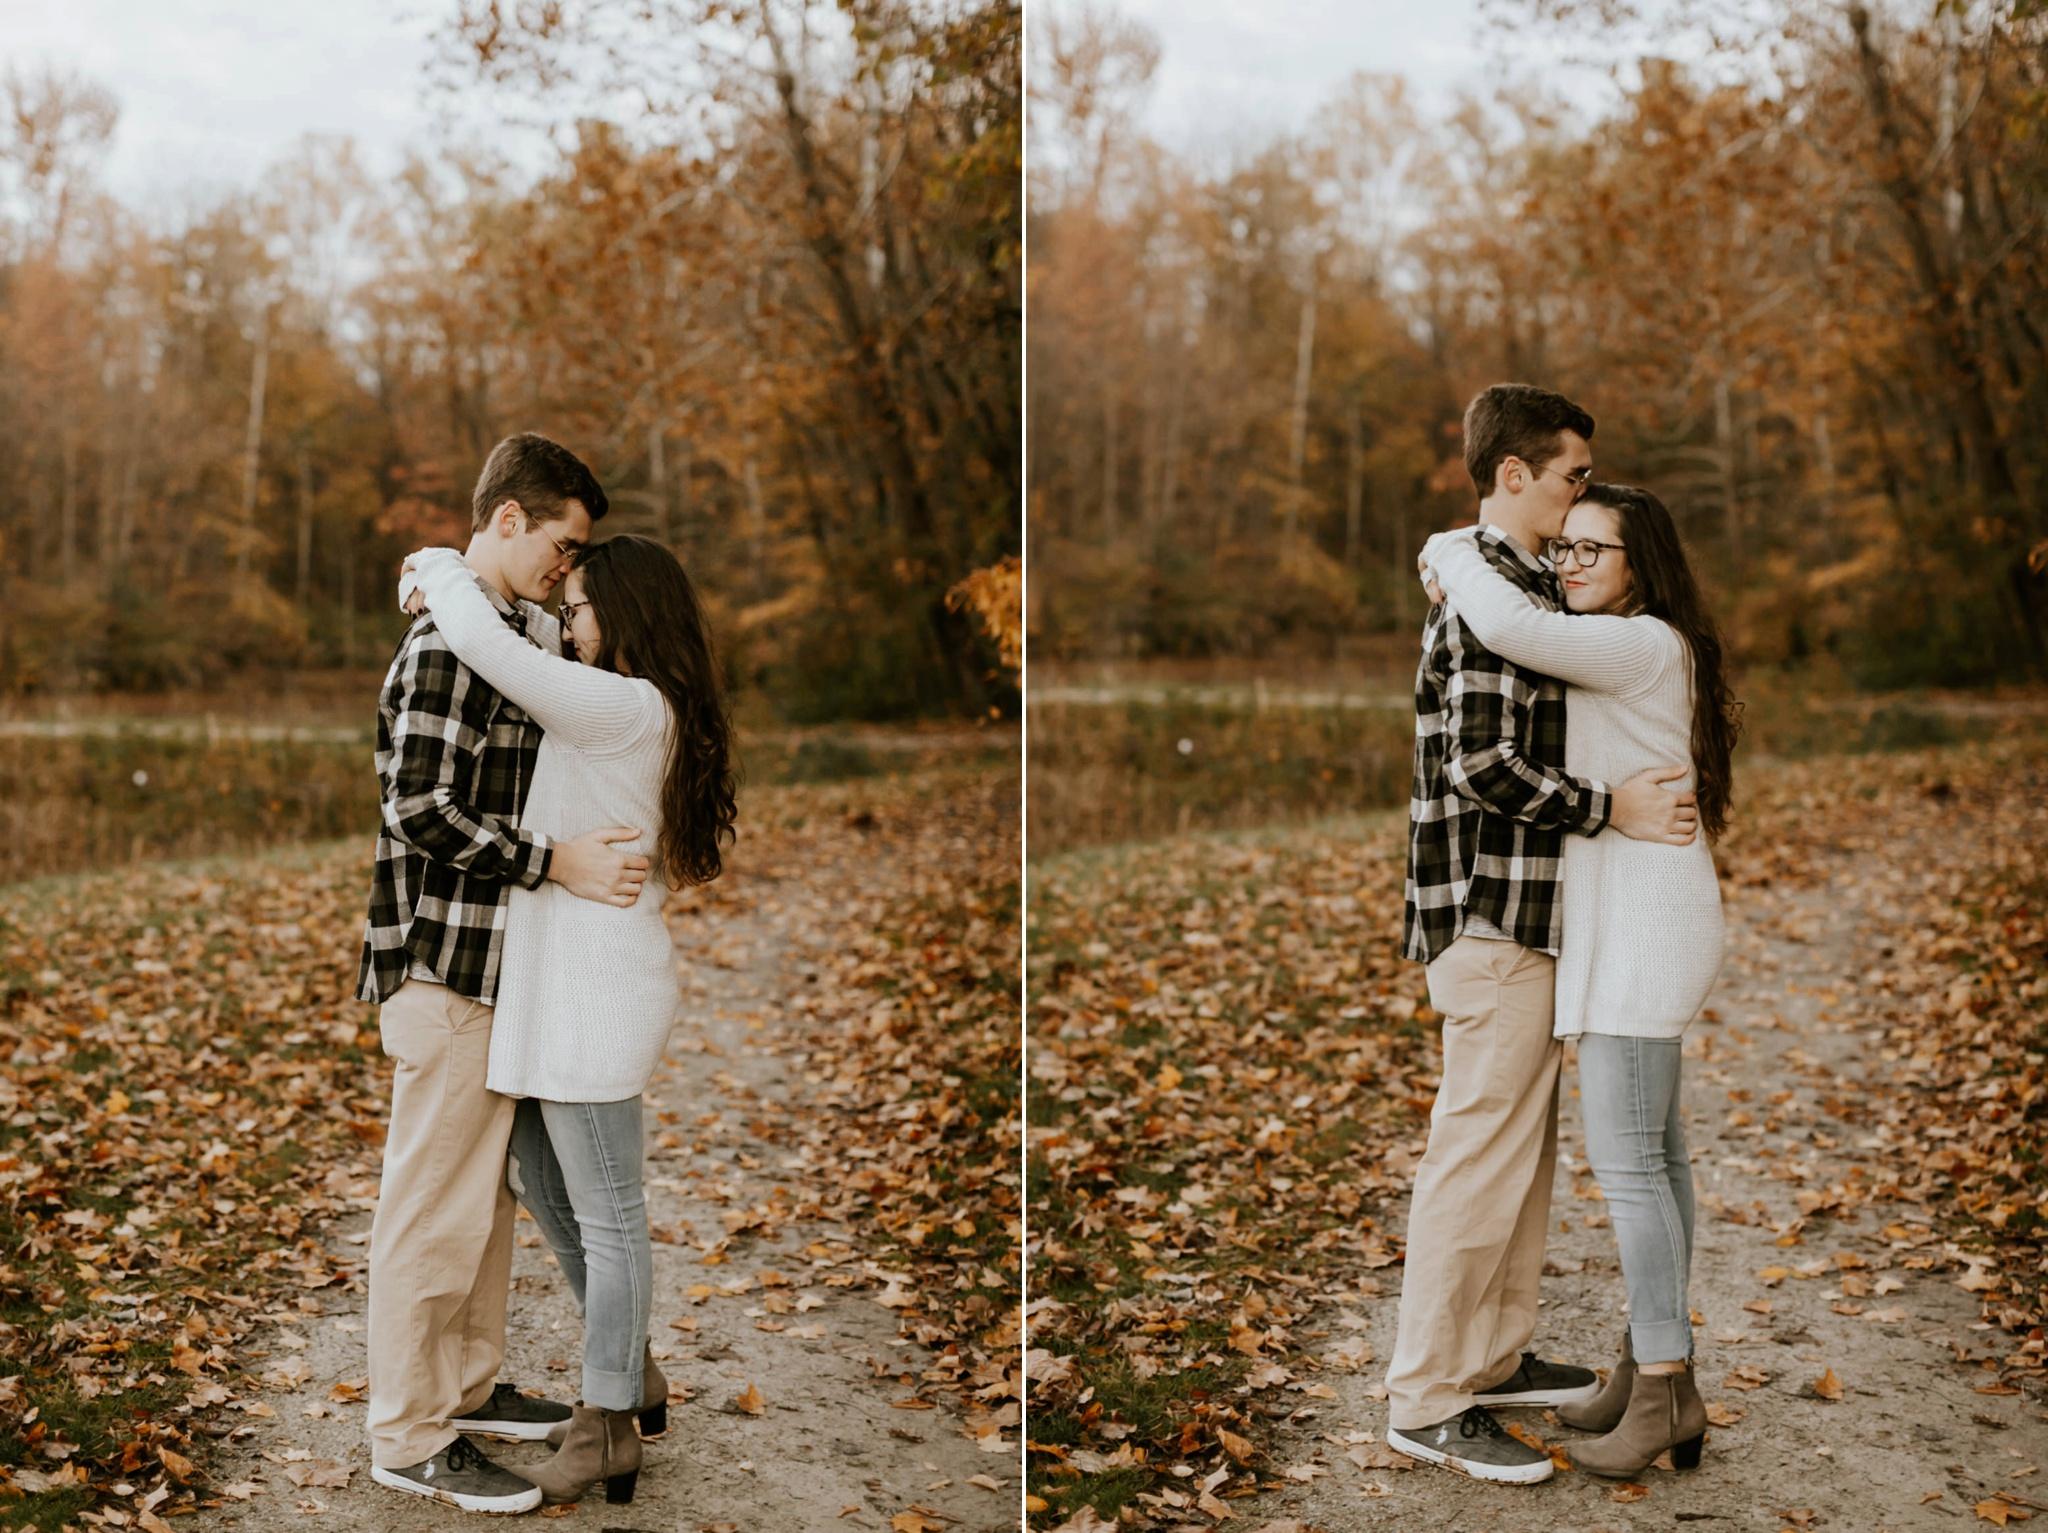 17-10-30 Lauren and Joe Engagement Edited-118_WEB.jpg